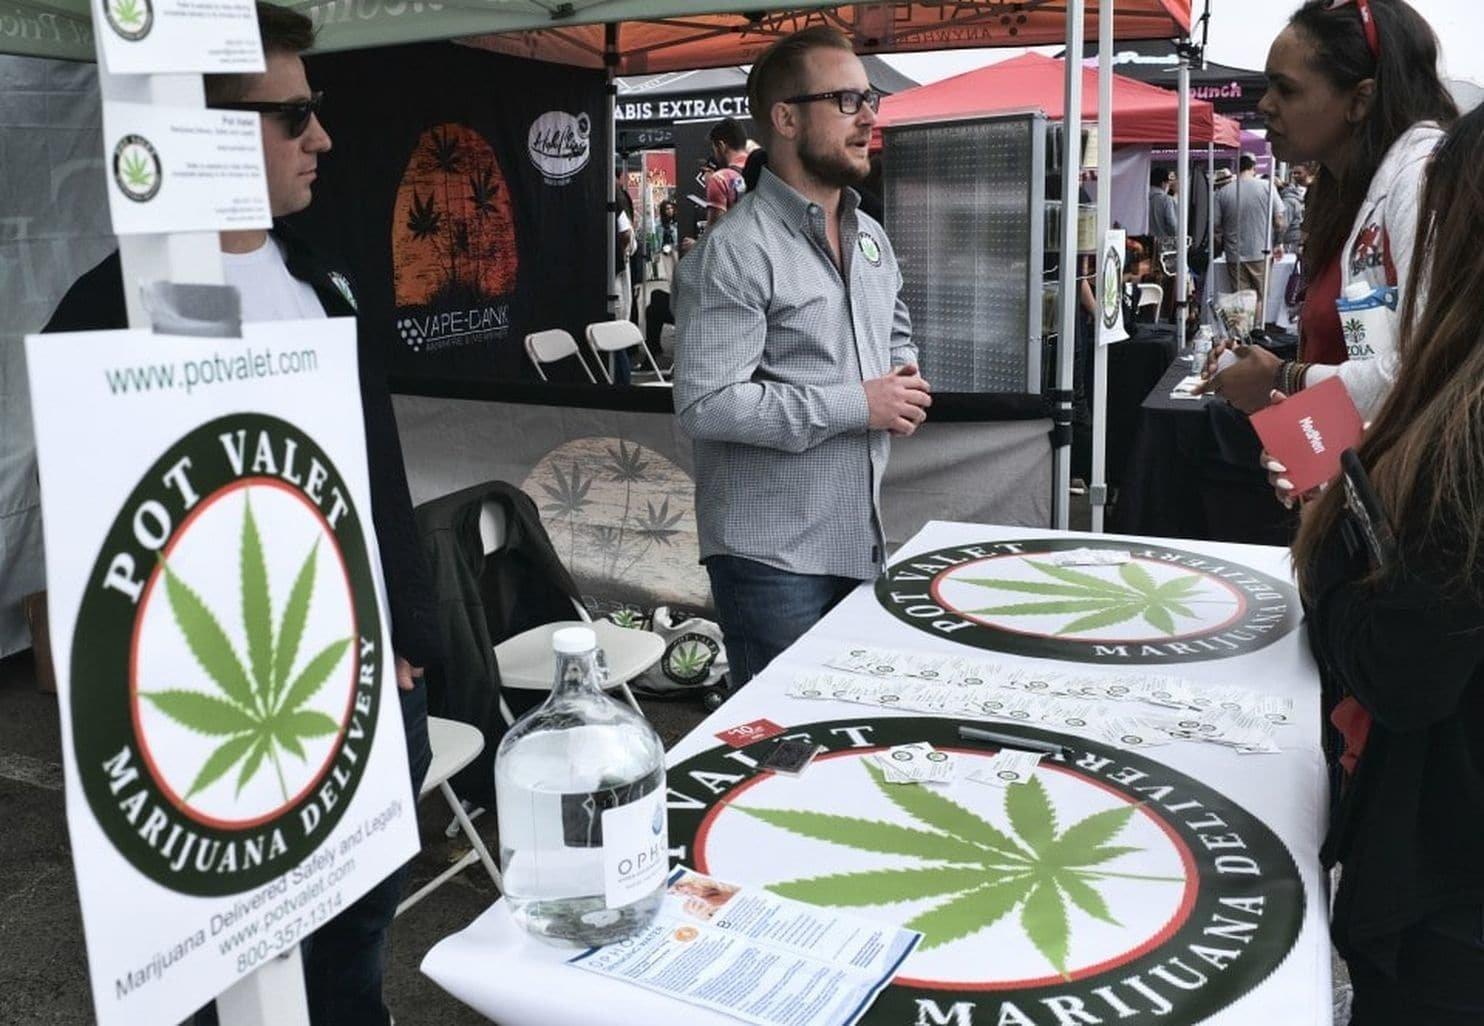 Why men support marijuana legalization more than women do